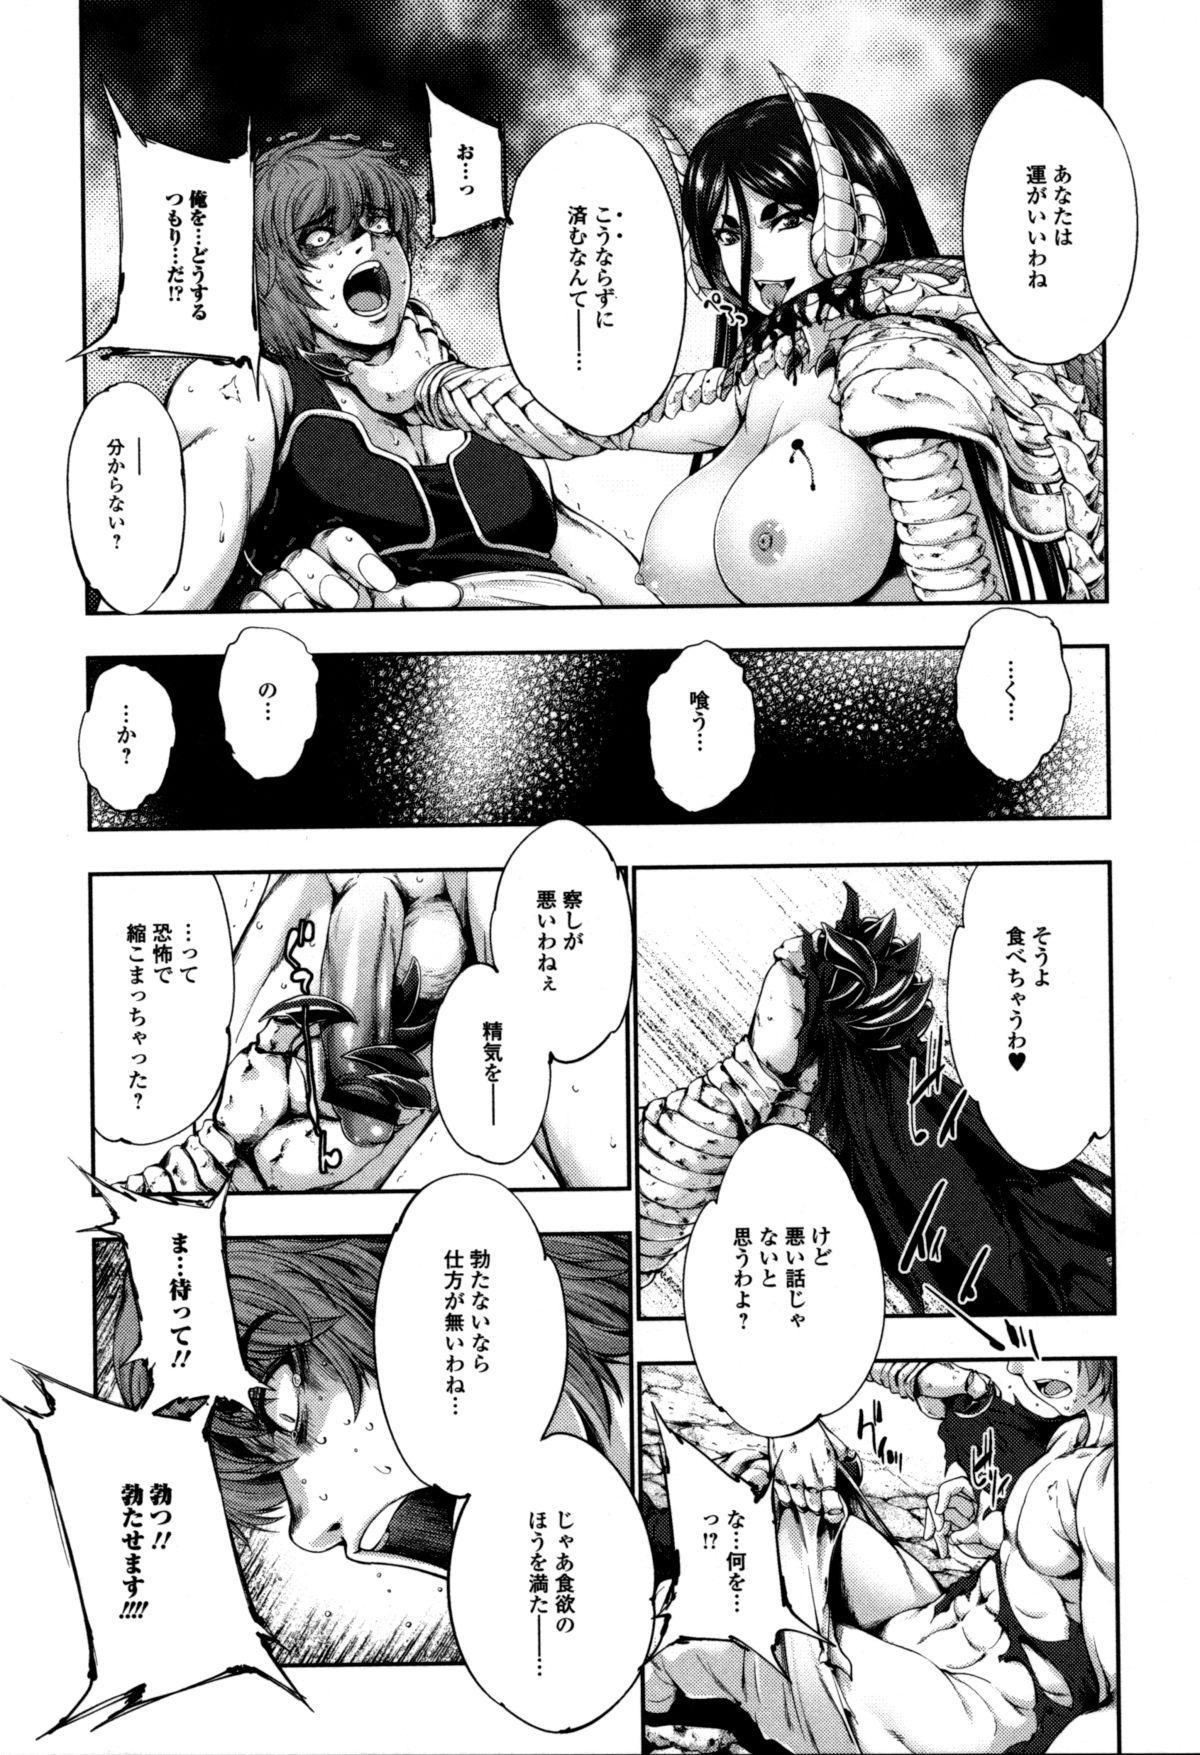 Monster Musume to no Kougou 16